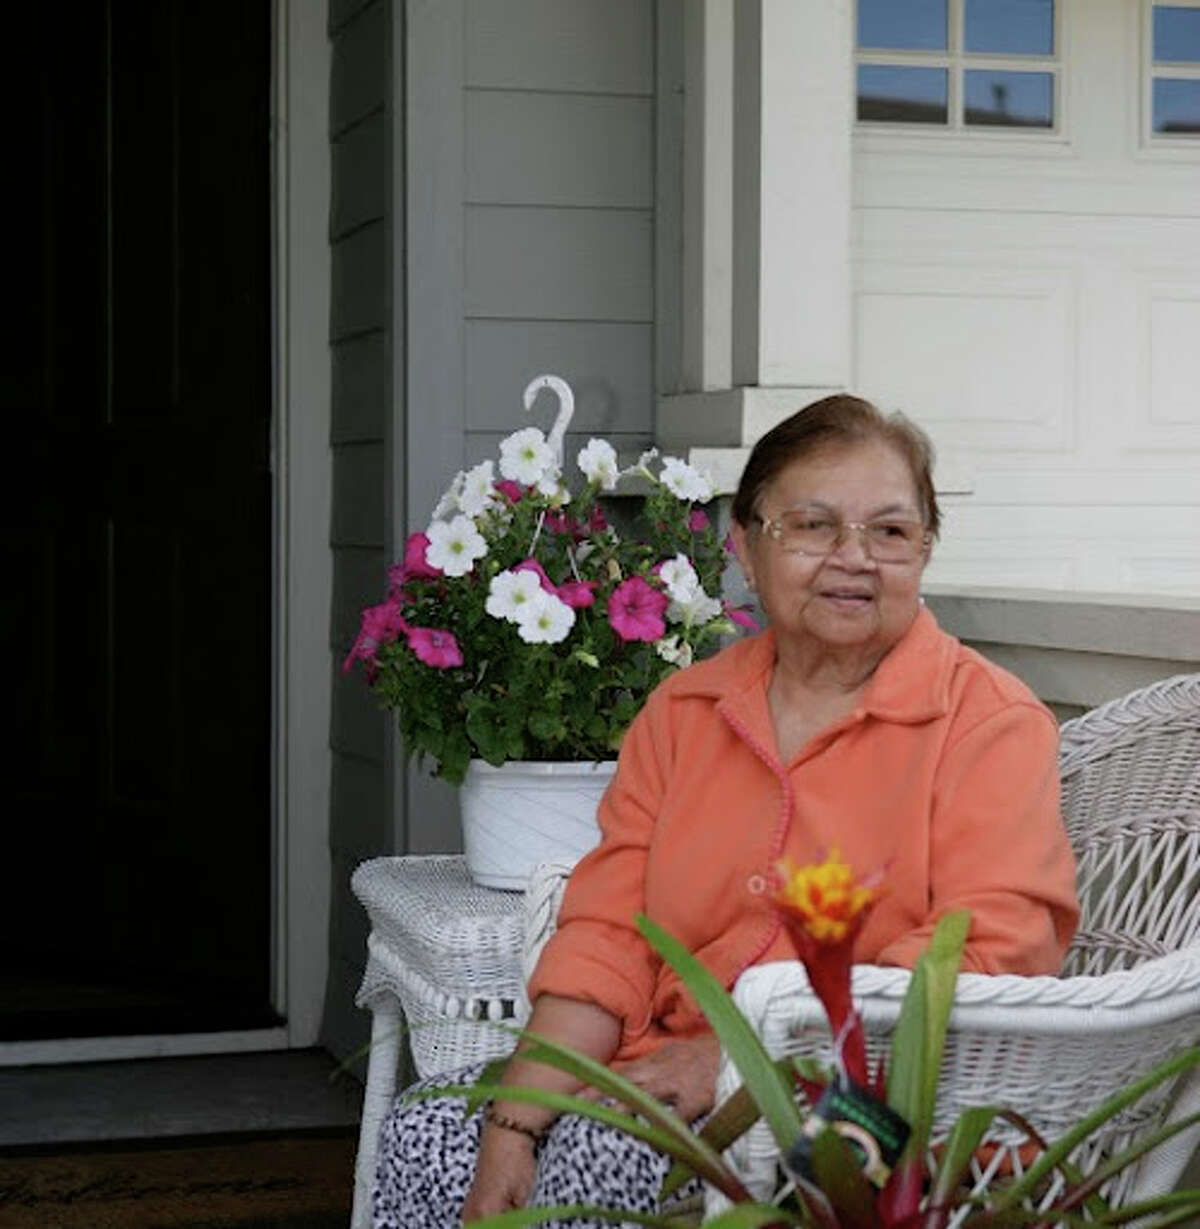 Gloria Montalvo volunteers her time visiting gravesites.